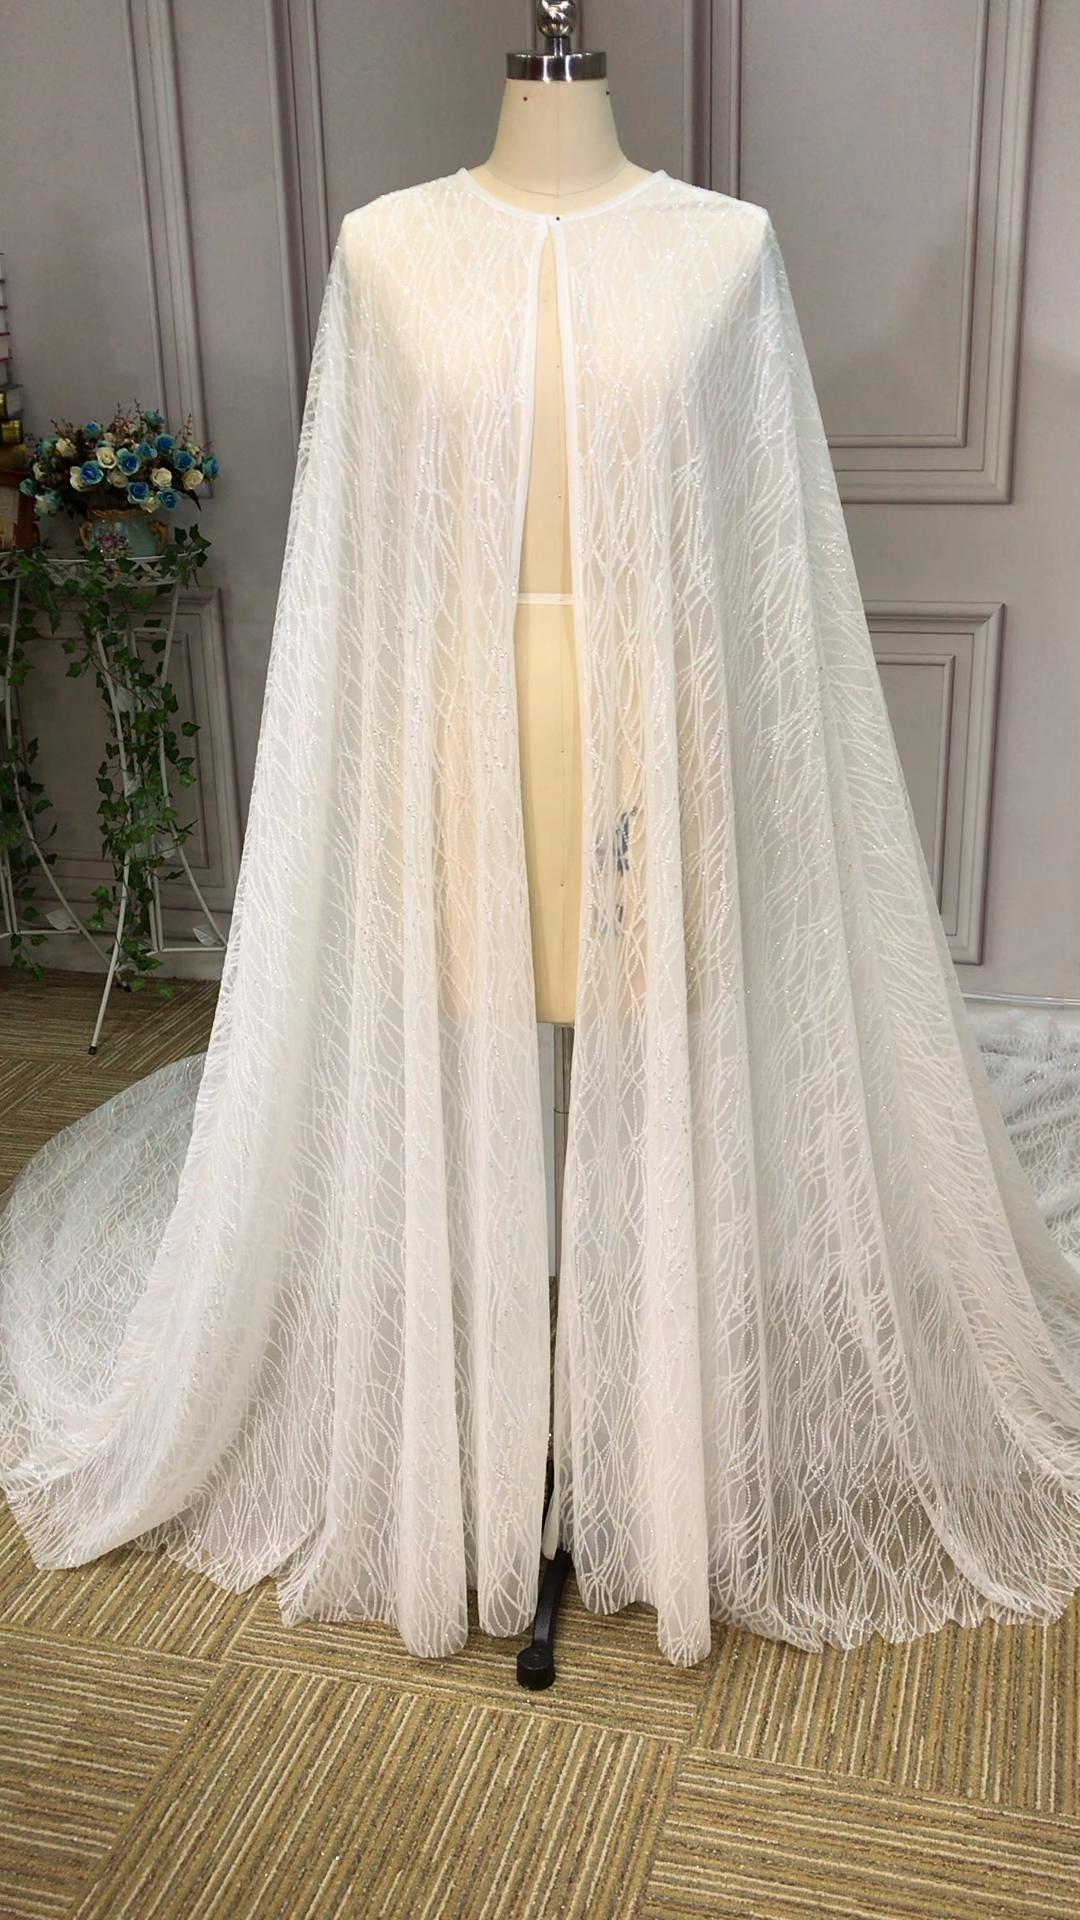 Sparkling Glitter wedding cloak long bridal jacket 2020 wedding fashion trends -   style Hijab wedding